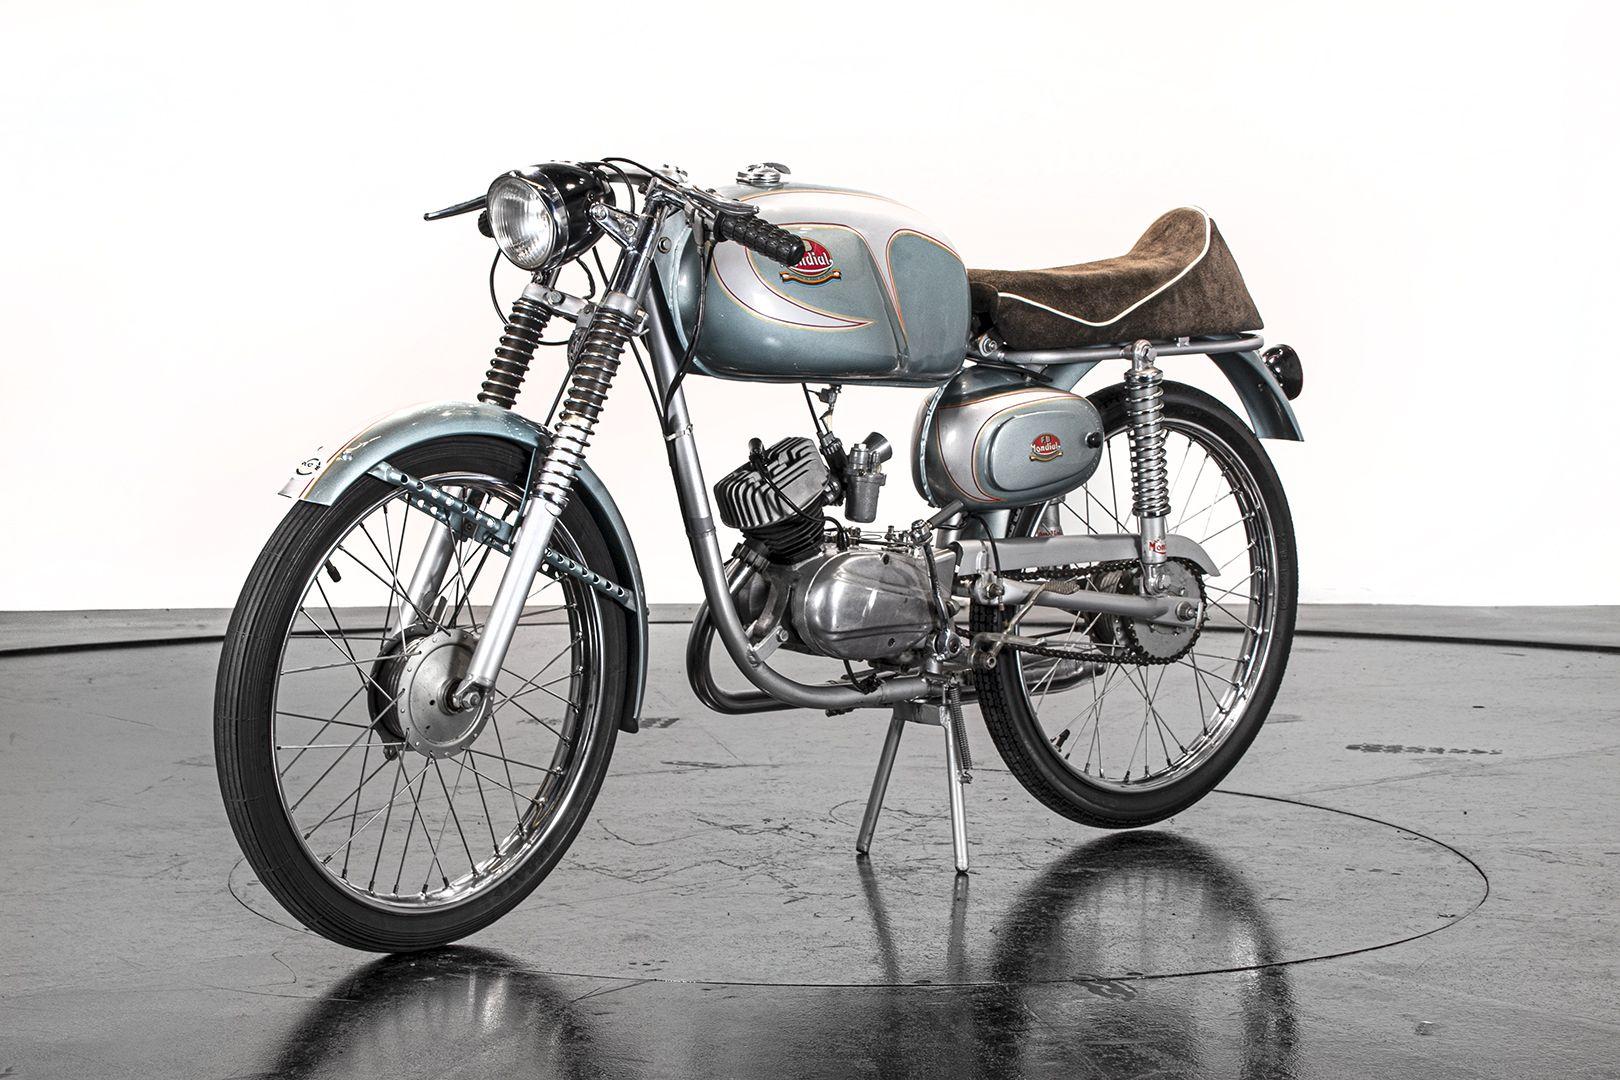 1972 Mondial Nova 61351